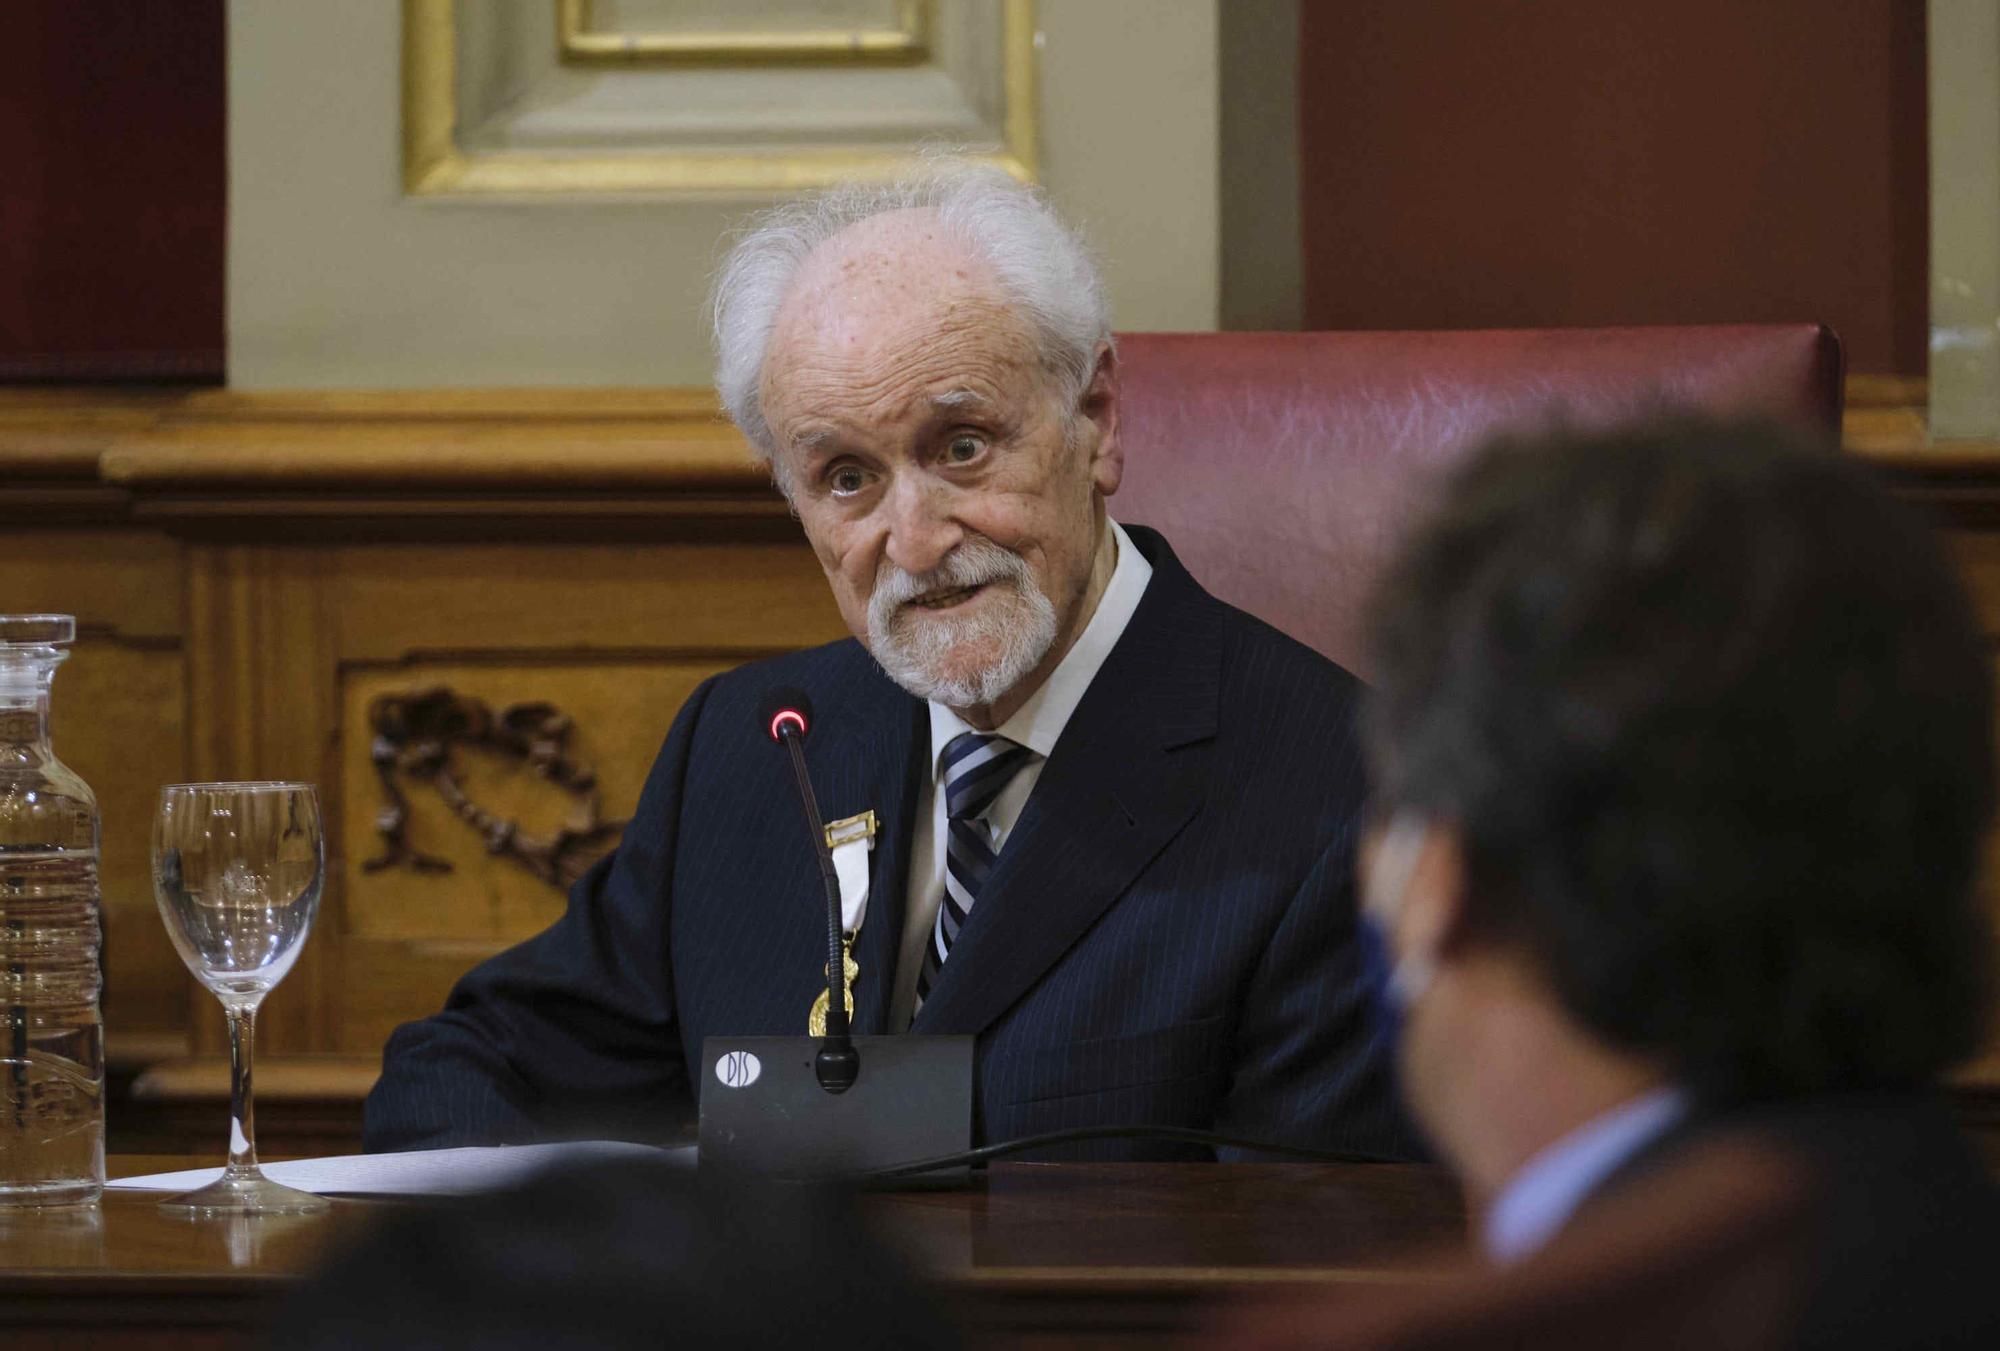 Acto de entrega de la Medalla de Oro al Mérito Cultural a Armando Alfonso